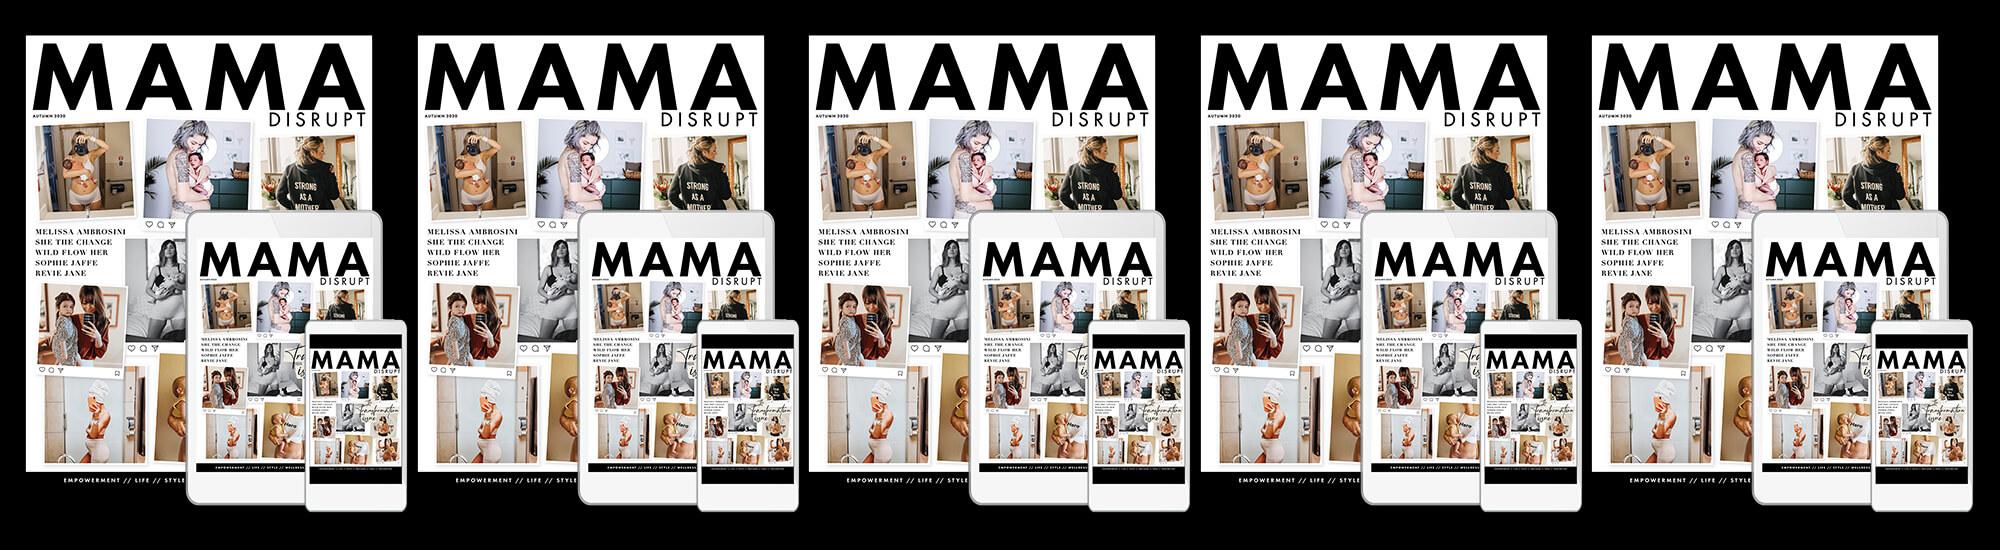 Mama Disrupt® TRANSFORMATION Issue